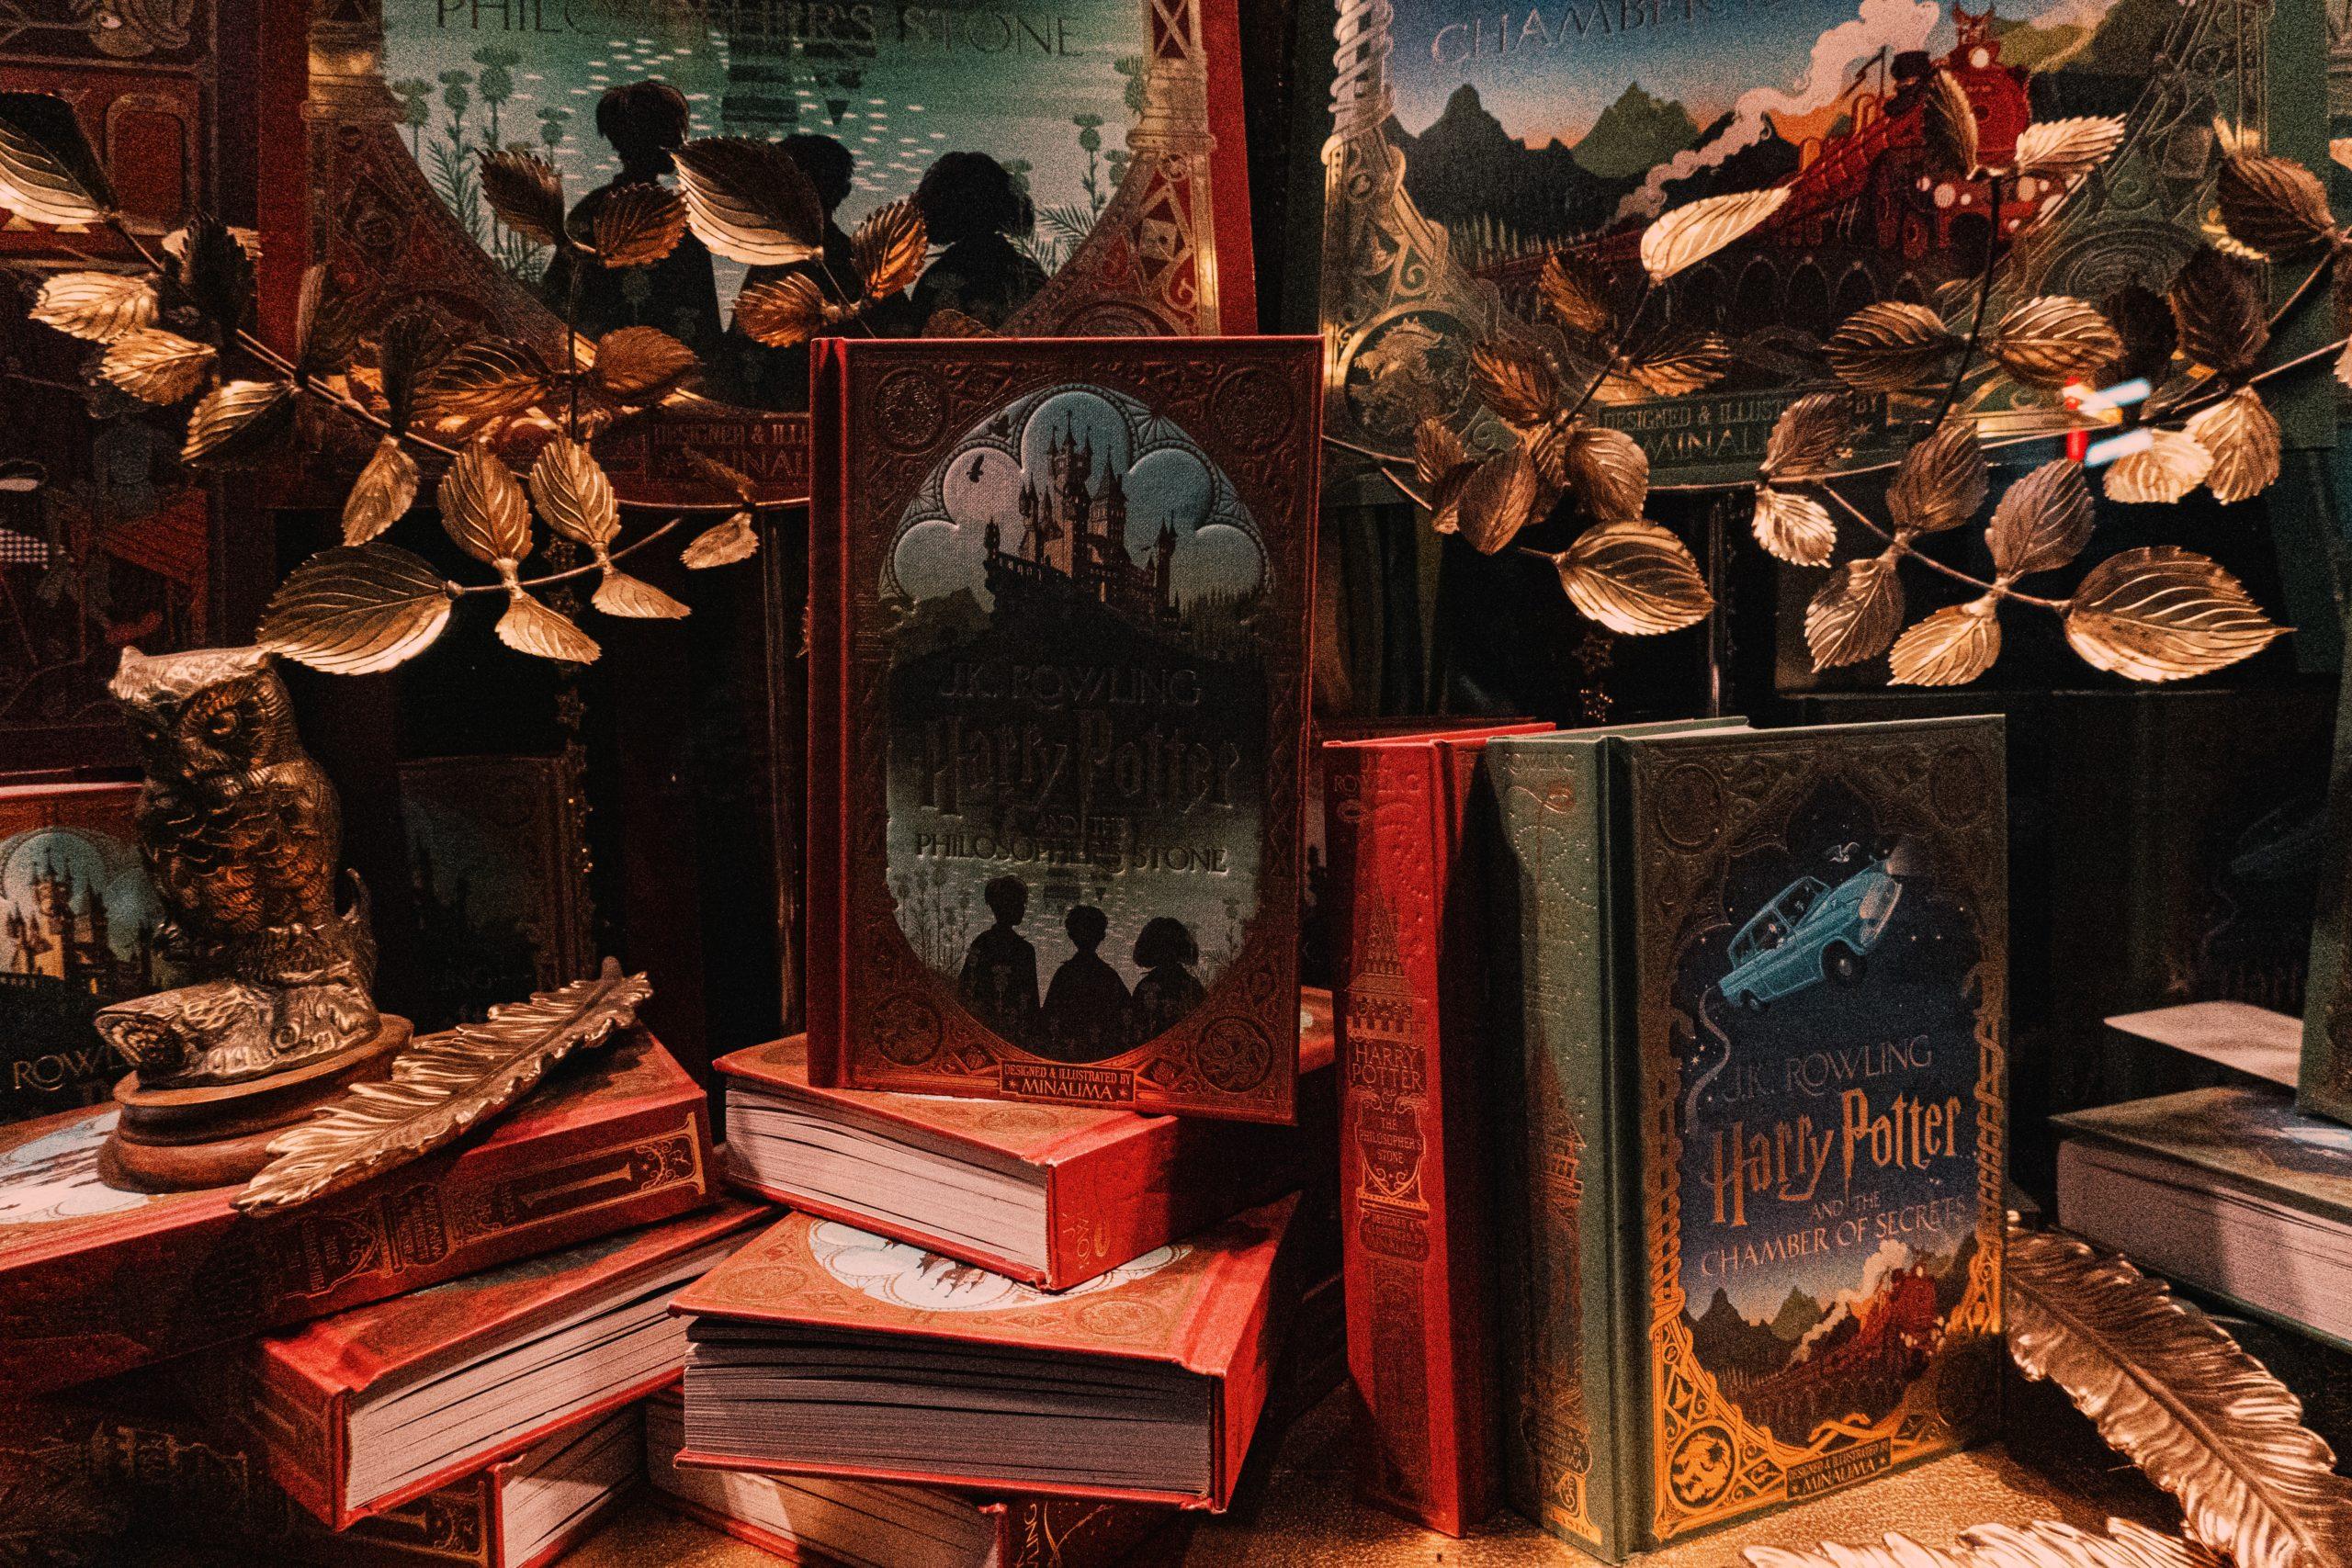 Harry Potter & Journalism